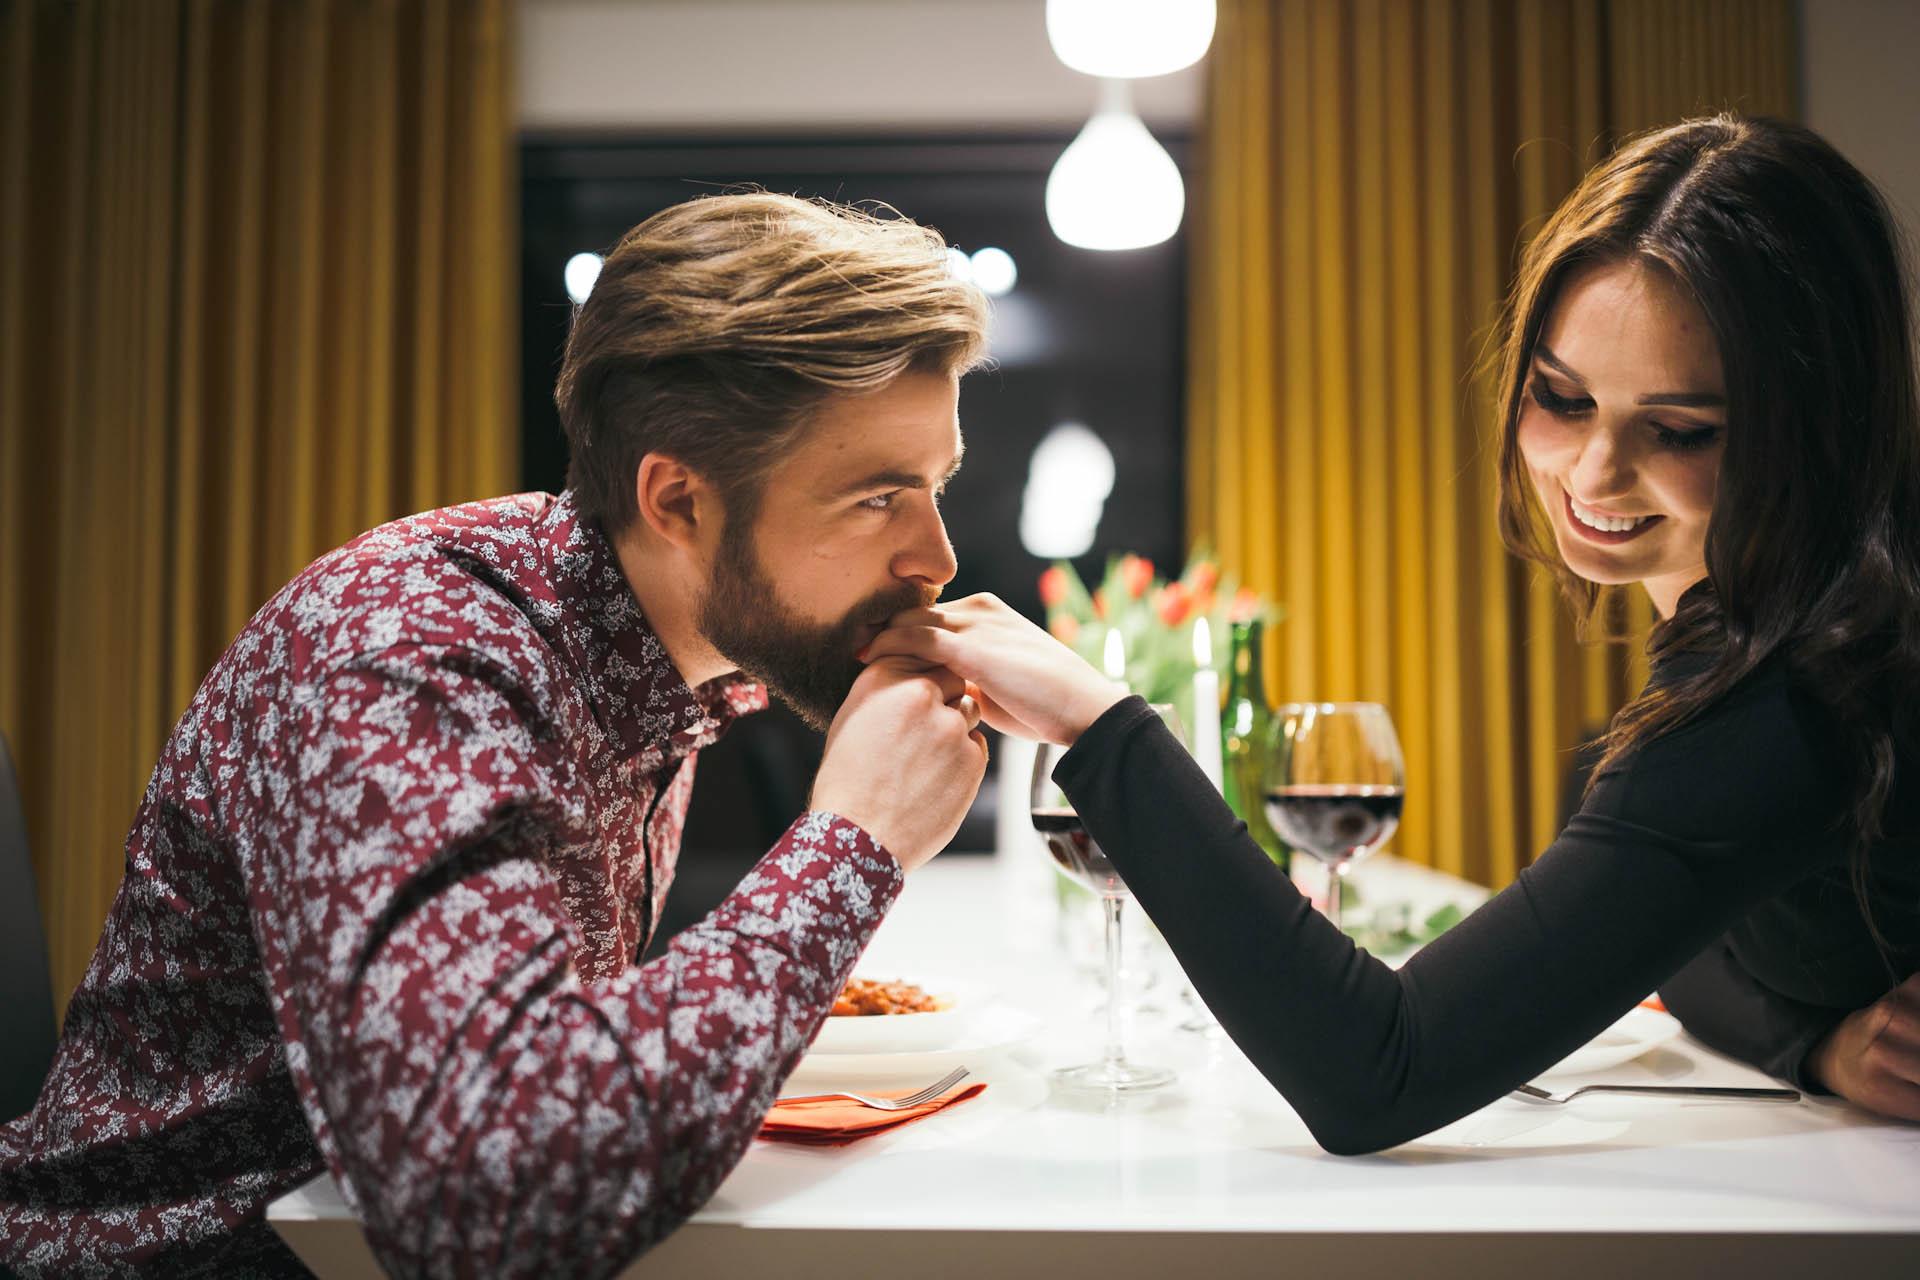 Mann flirtet und küsst Mädchenhand im Café